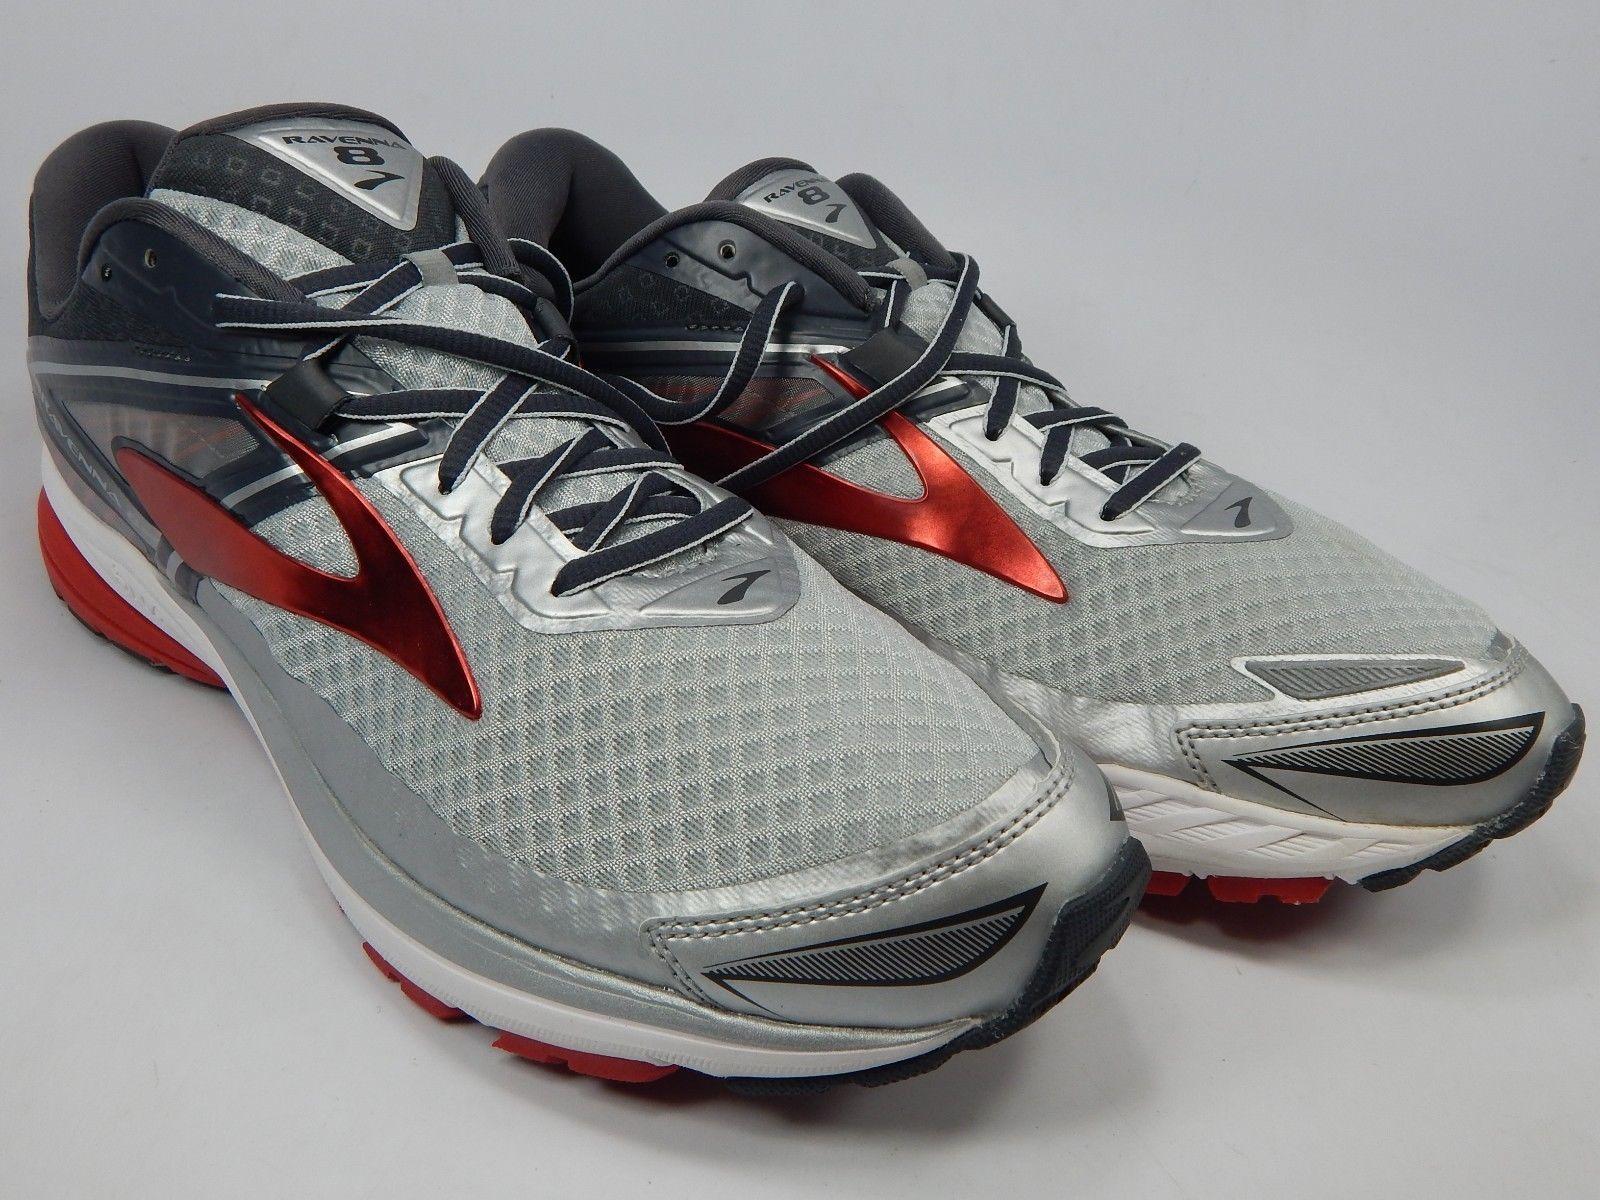 86934fa4b1de0 57. 57. Previous. Brooks Ravenna 8 Size US 11.5 M (D) EU 45.5 Men s Running  Shoes 1102481D067 · Brooks Ravenna ...